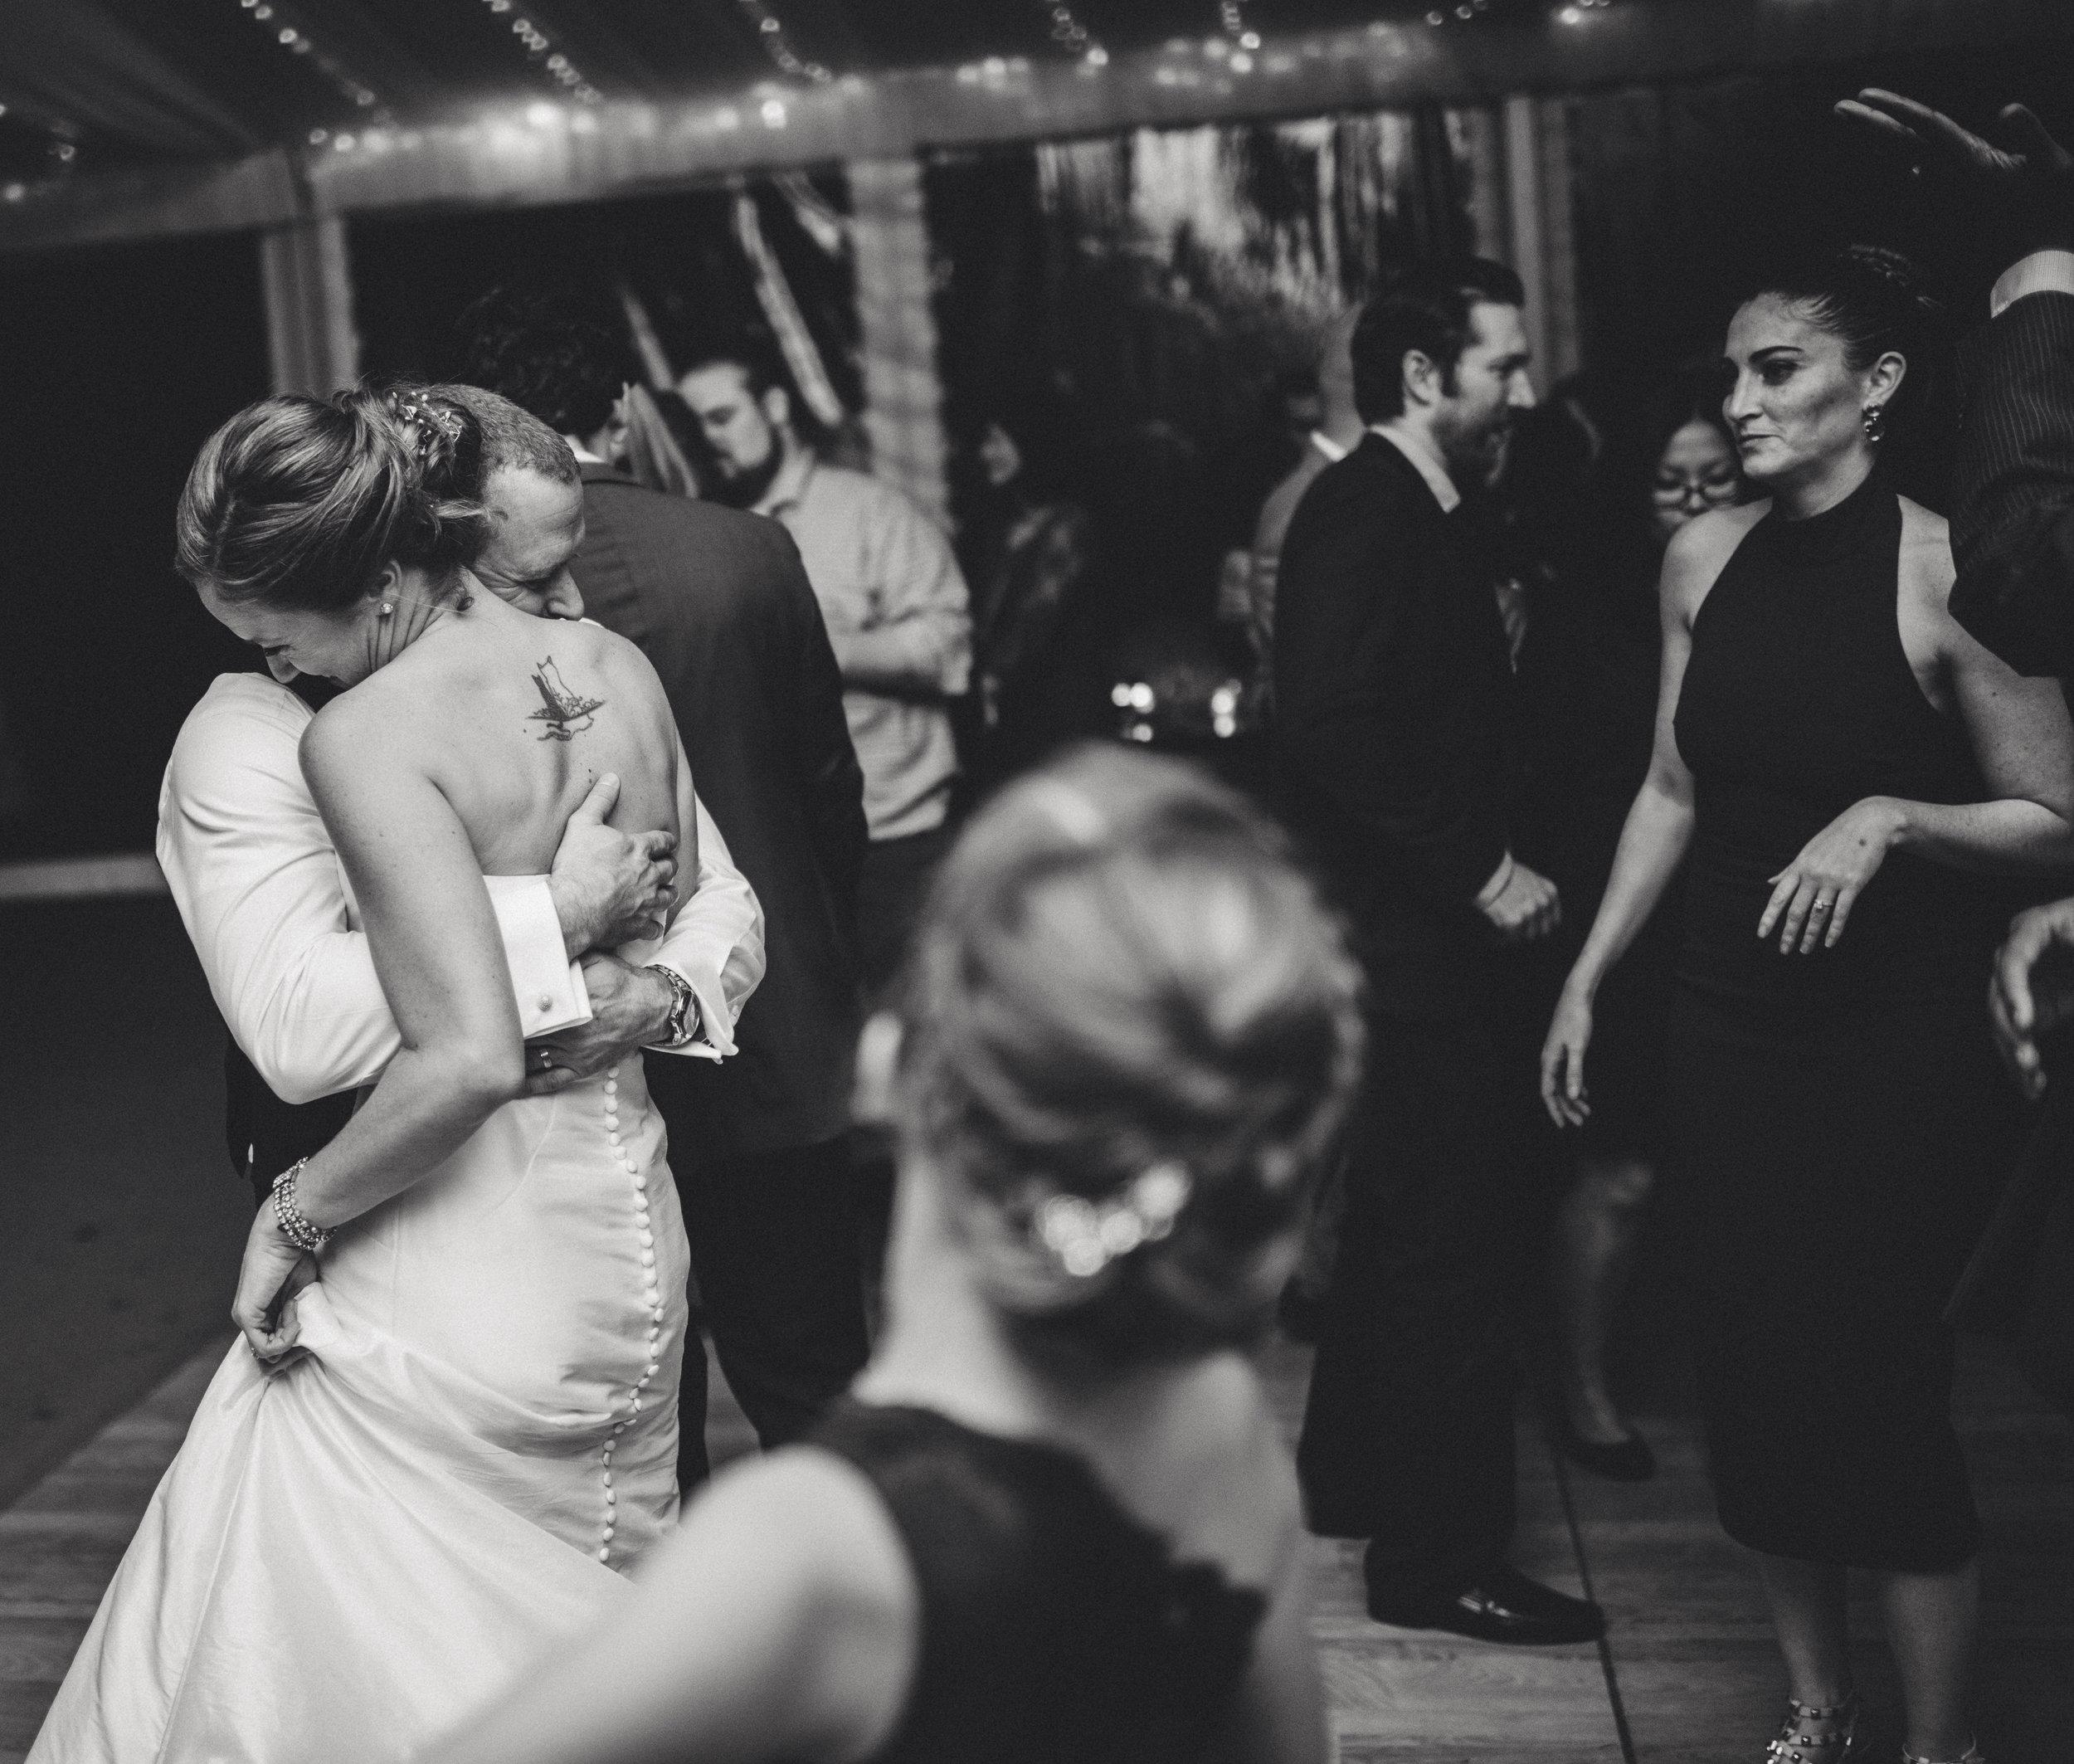 JACQUELINE & ANDREW WARSHAWER -BROOKMILL FARM FALL WEDDING - INTIMATE WEDDING PHOTOGRAPHER - TWOTWENTY by CHI-CHI AGBIM-807.jpg